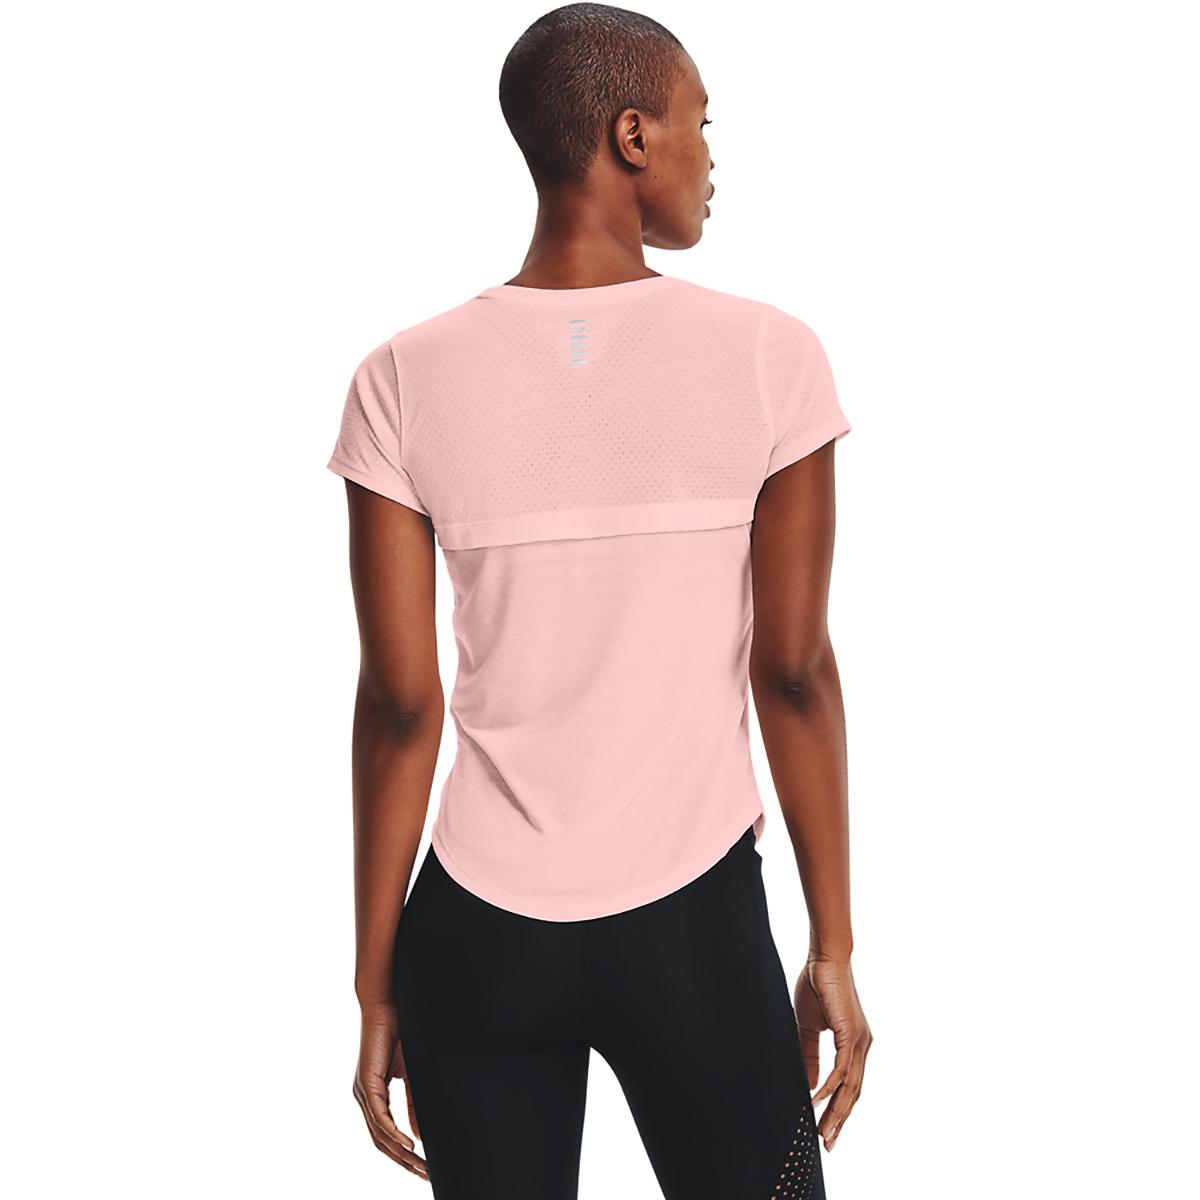 Women's Under Armour Streaker Run Short Sleeve - Color: Beta Tint/ Beta - Size: XS, Beta Tint/ Beta, large, image 2